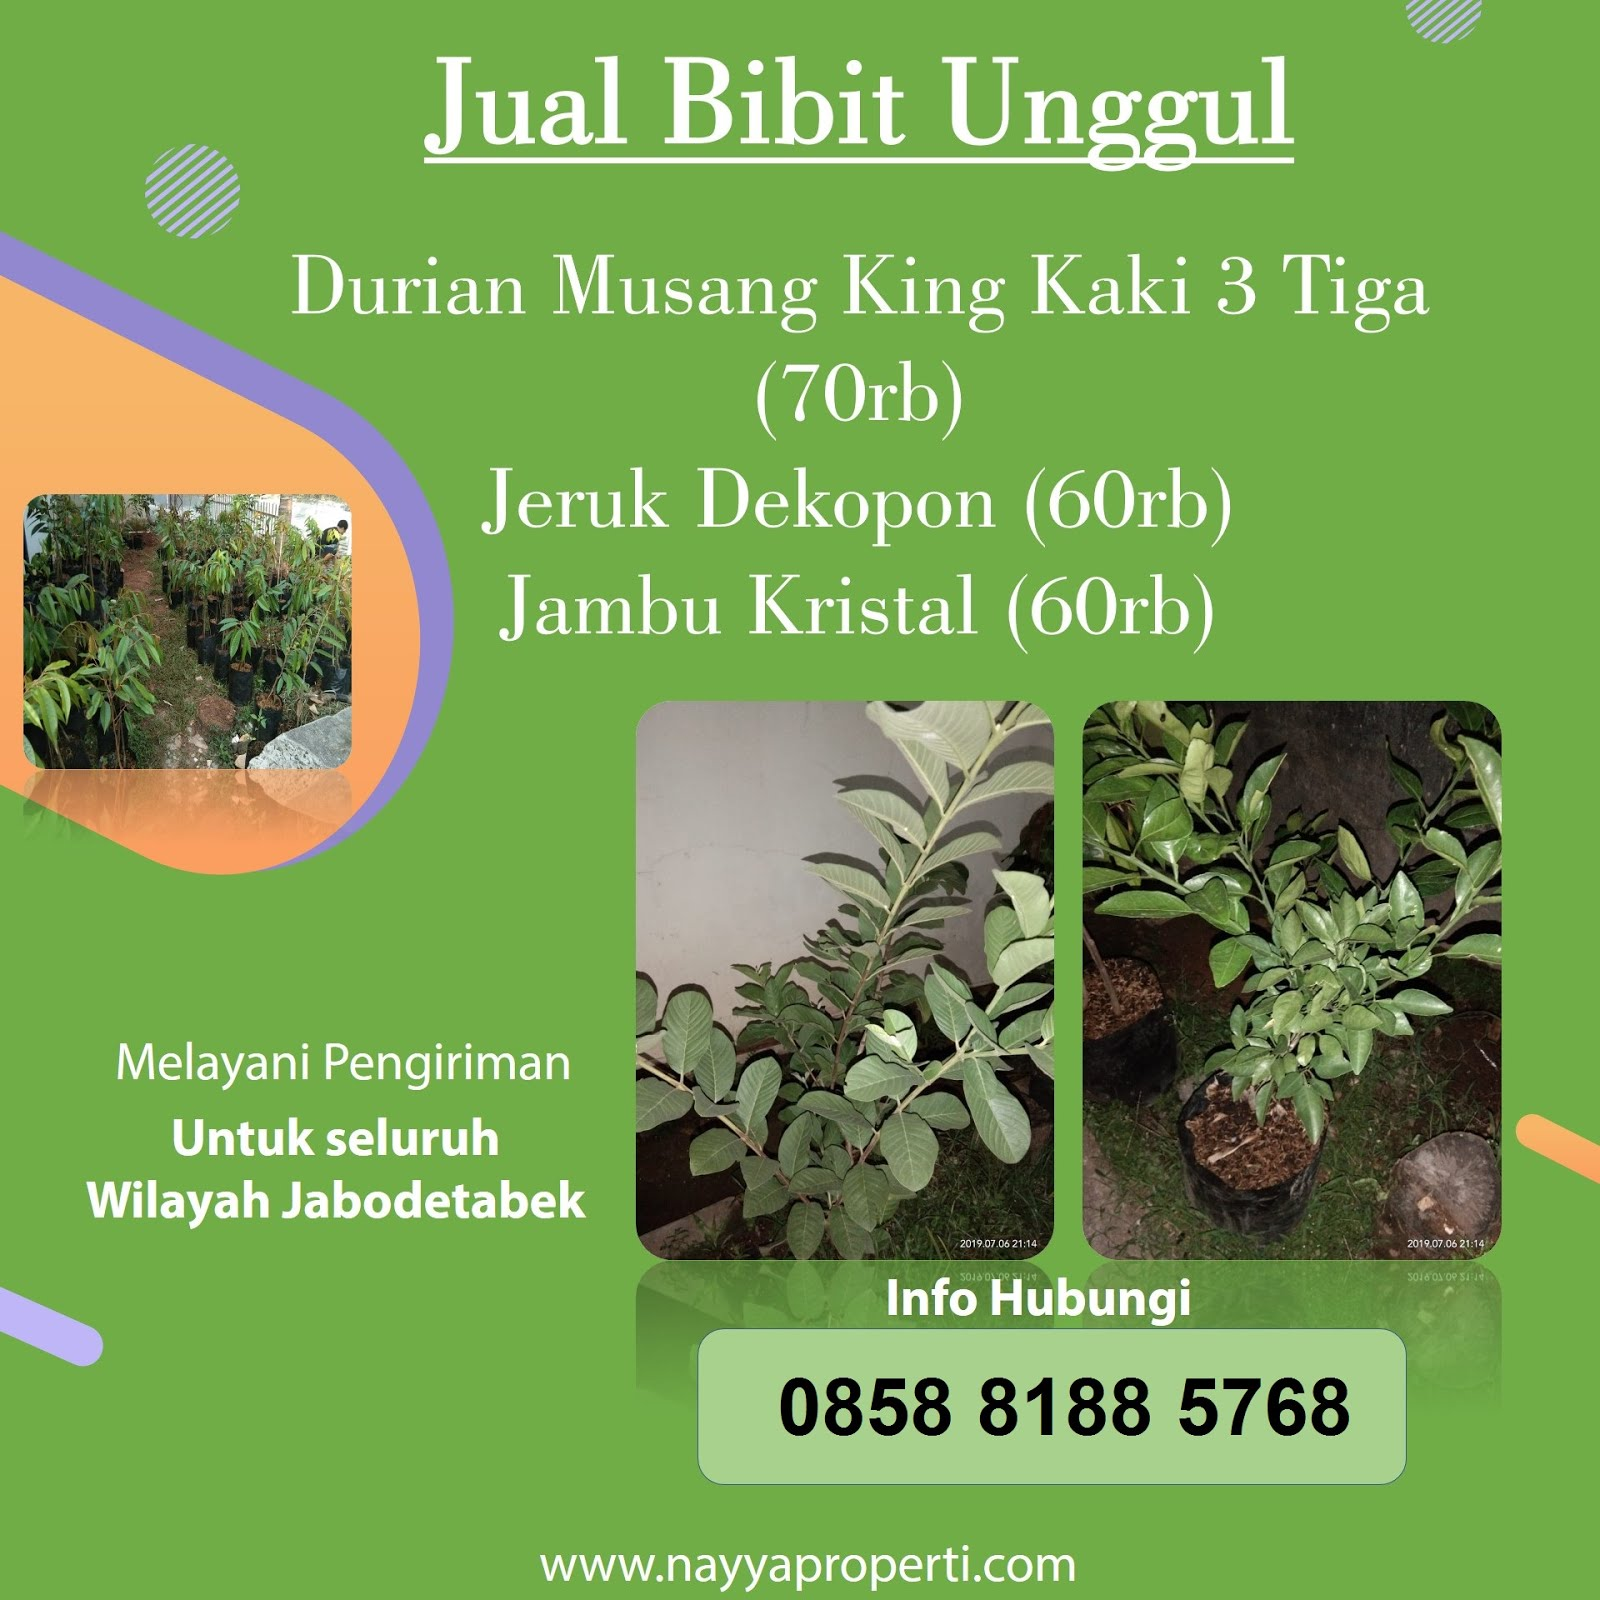 Jual Bibit Unggul Durian Musang King, Jeruk Dekopon, dan Jambu kristal